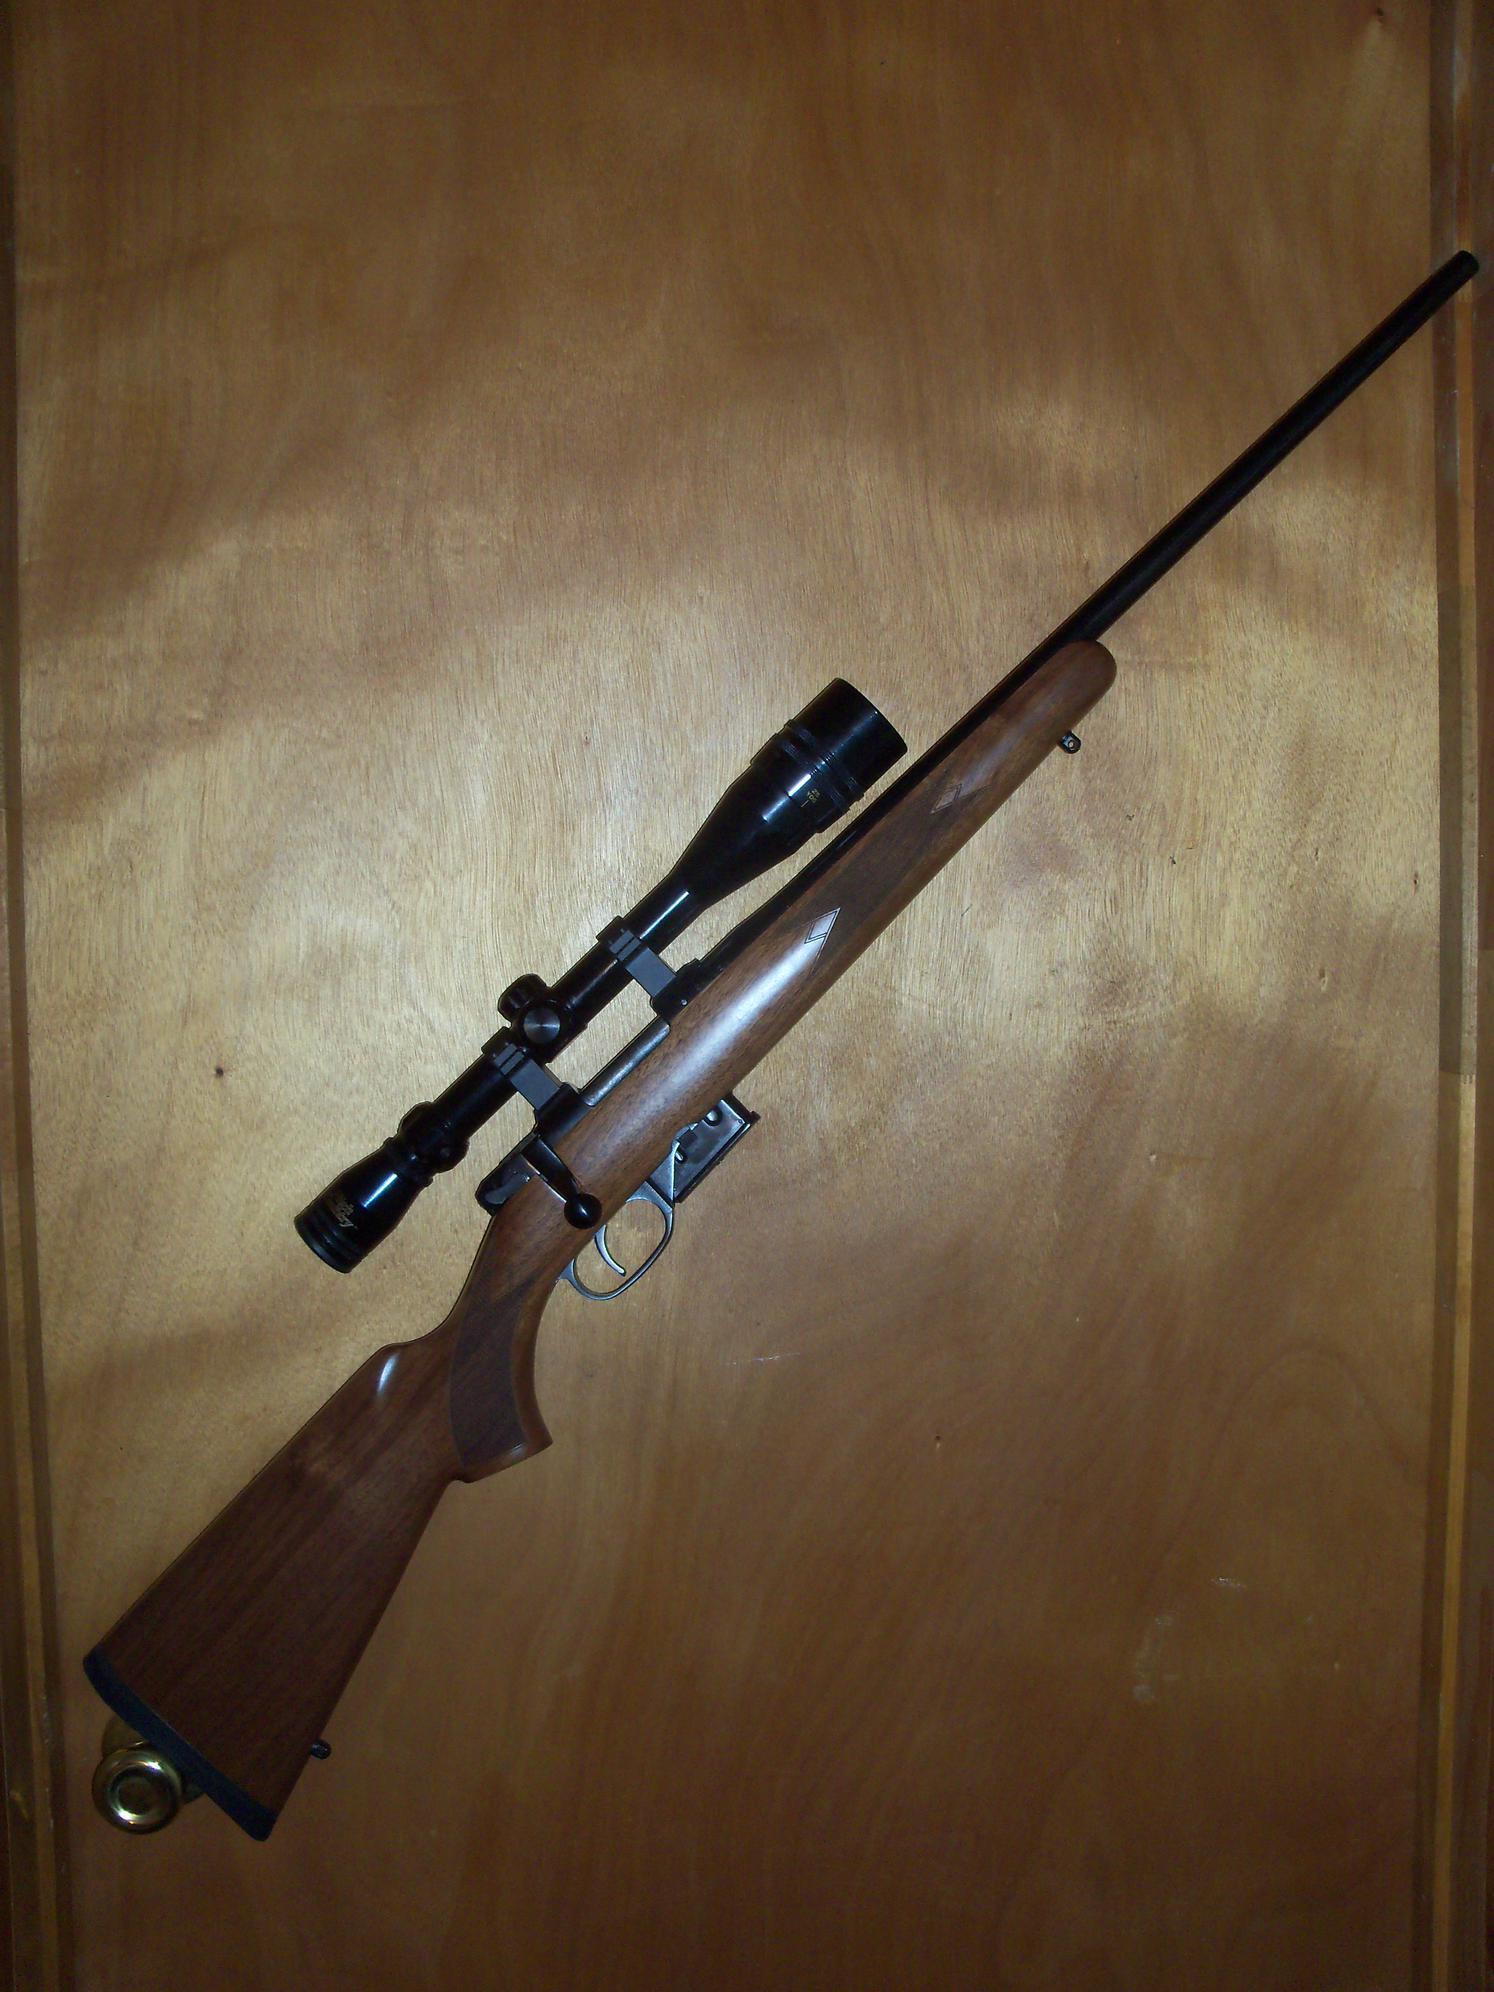 Hornet Gun Images - Reverse Search